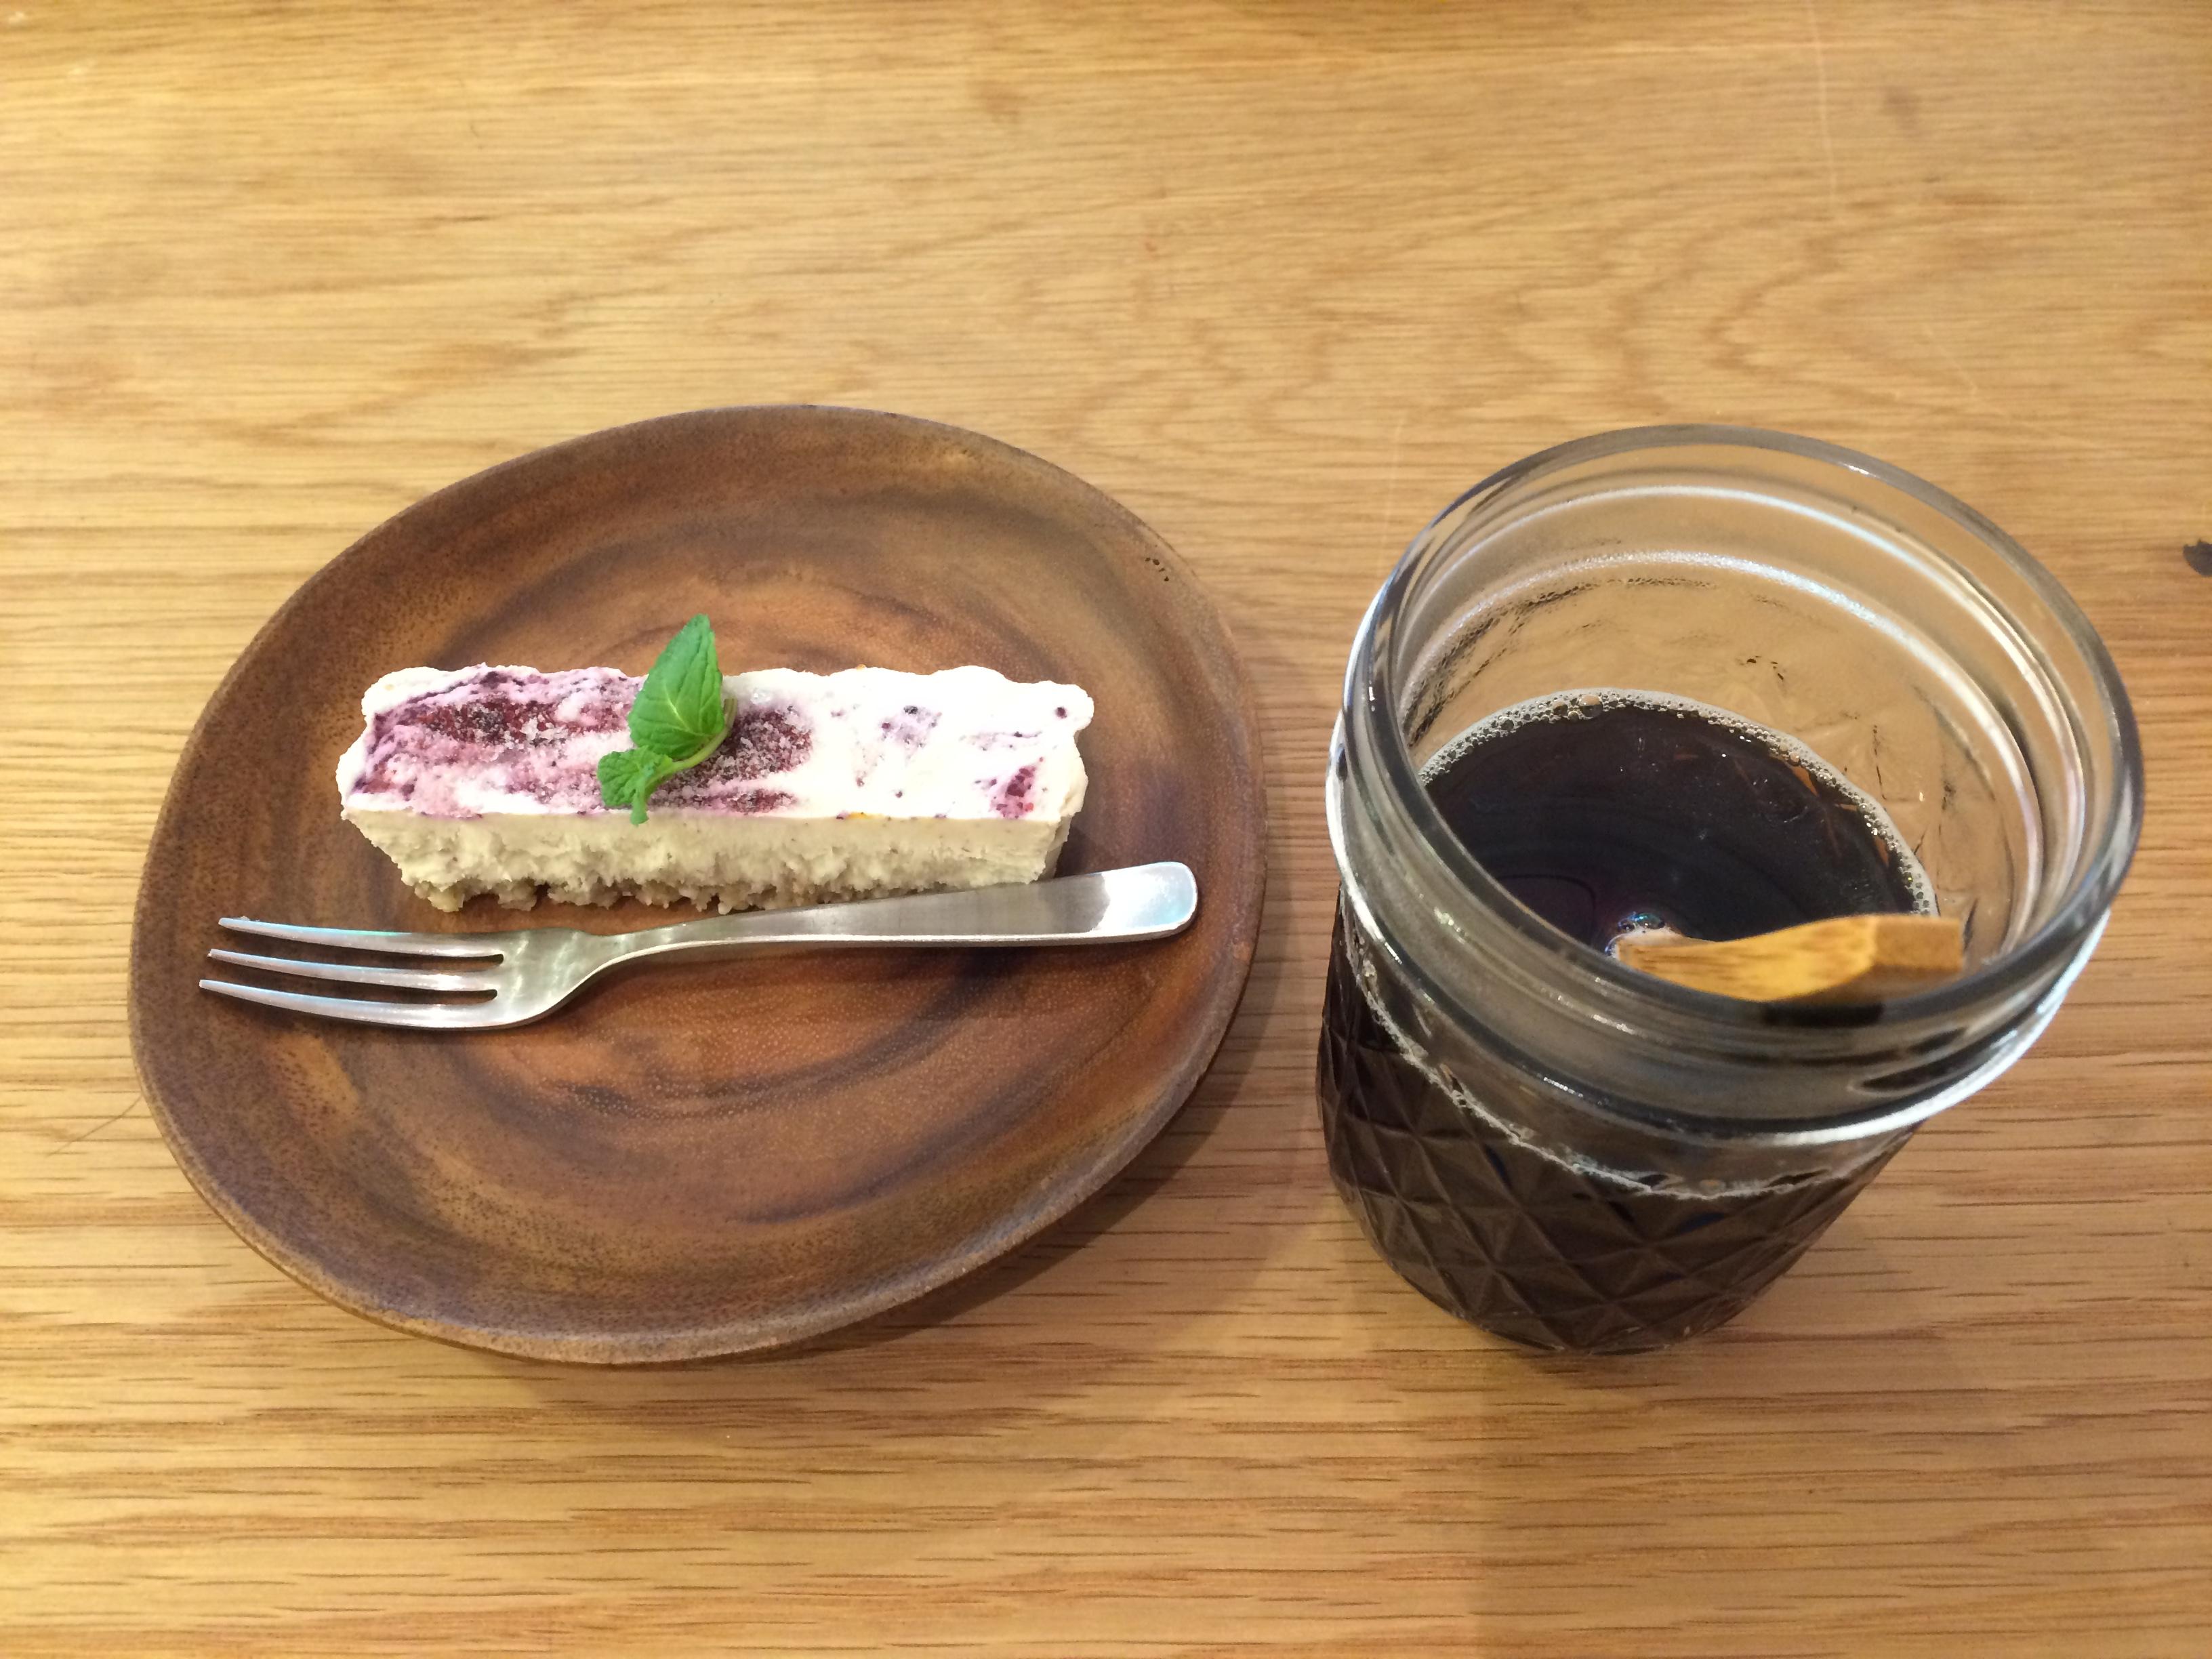 pranaローケーキと野菜コーヒー